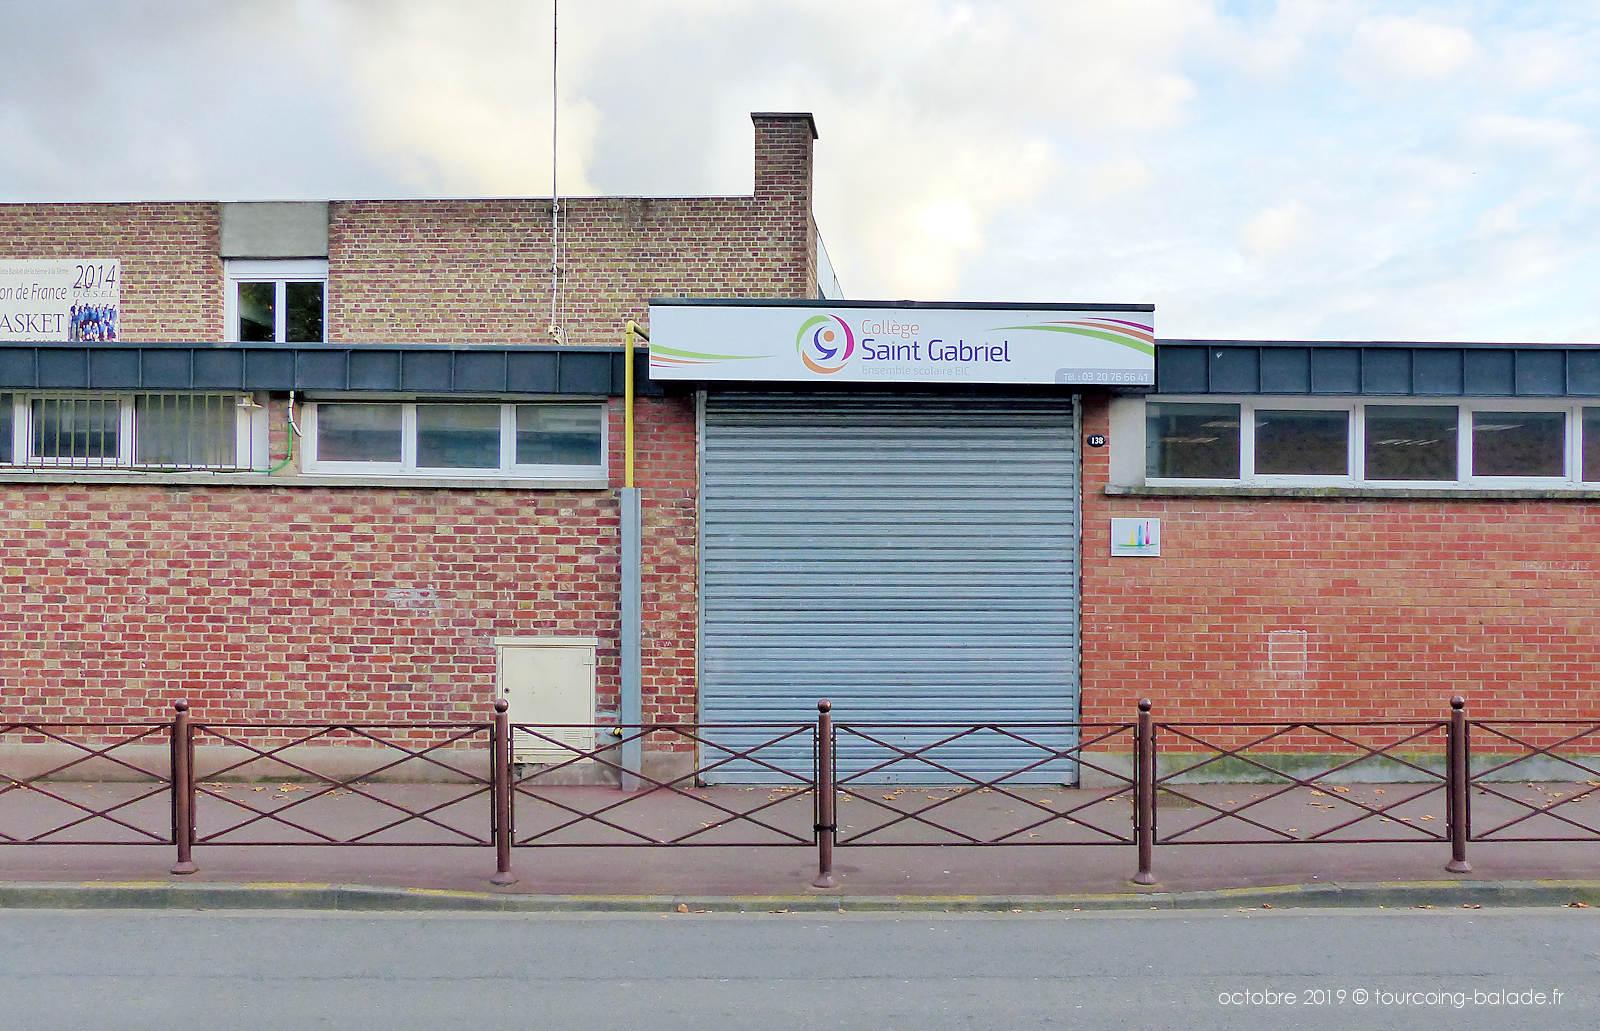 Collège Saint-Gabriel Tourcoing - Rue Lamartine